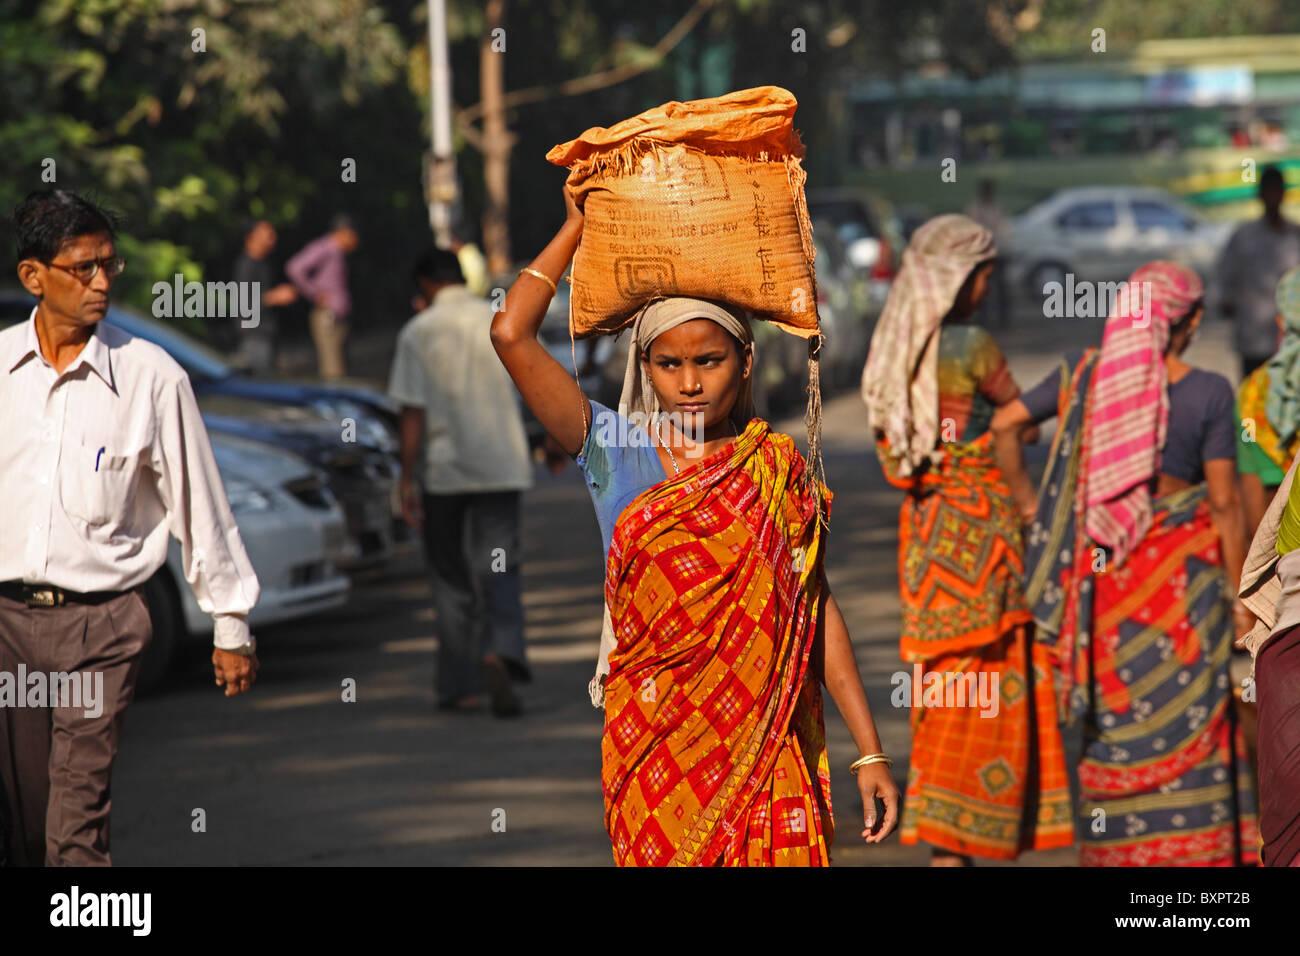 Indian manual worker in Mumbai, India - Stock Image